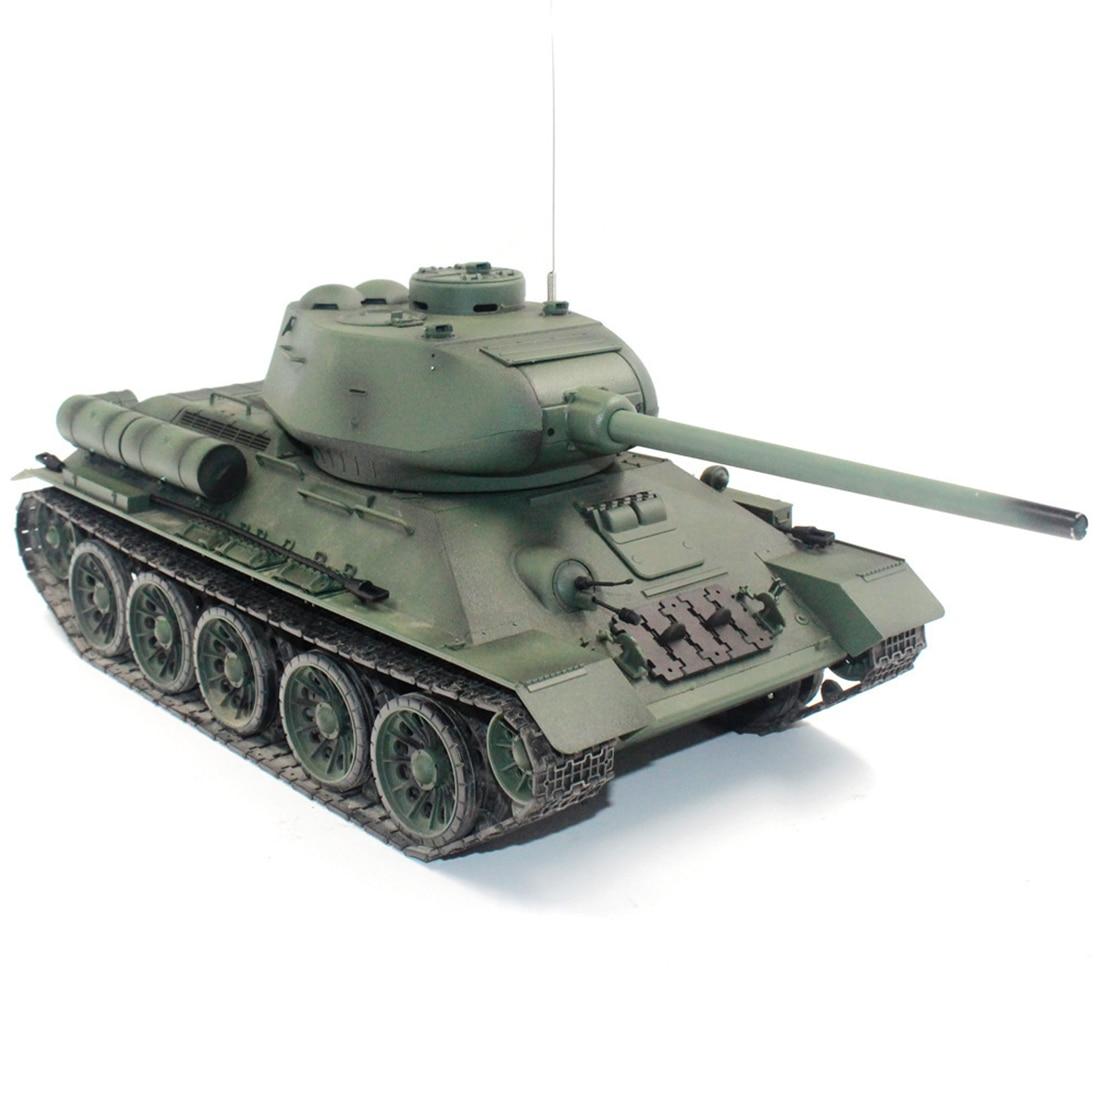 1:16 Soviet T-34 Medium Tank 2.4G Remote Control Model Military Tank with Sound Smoke Shooting Effect - Basic Edition